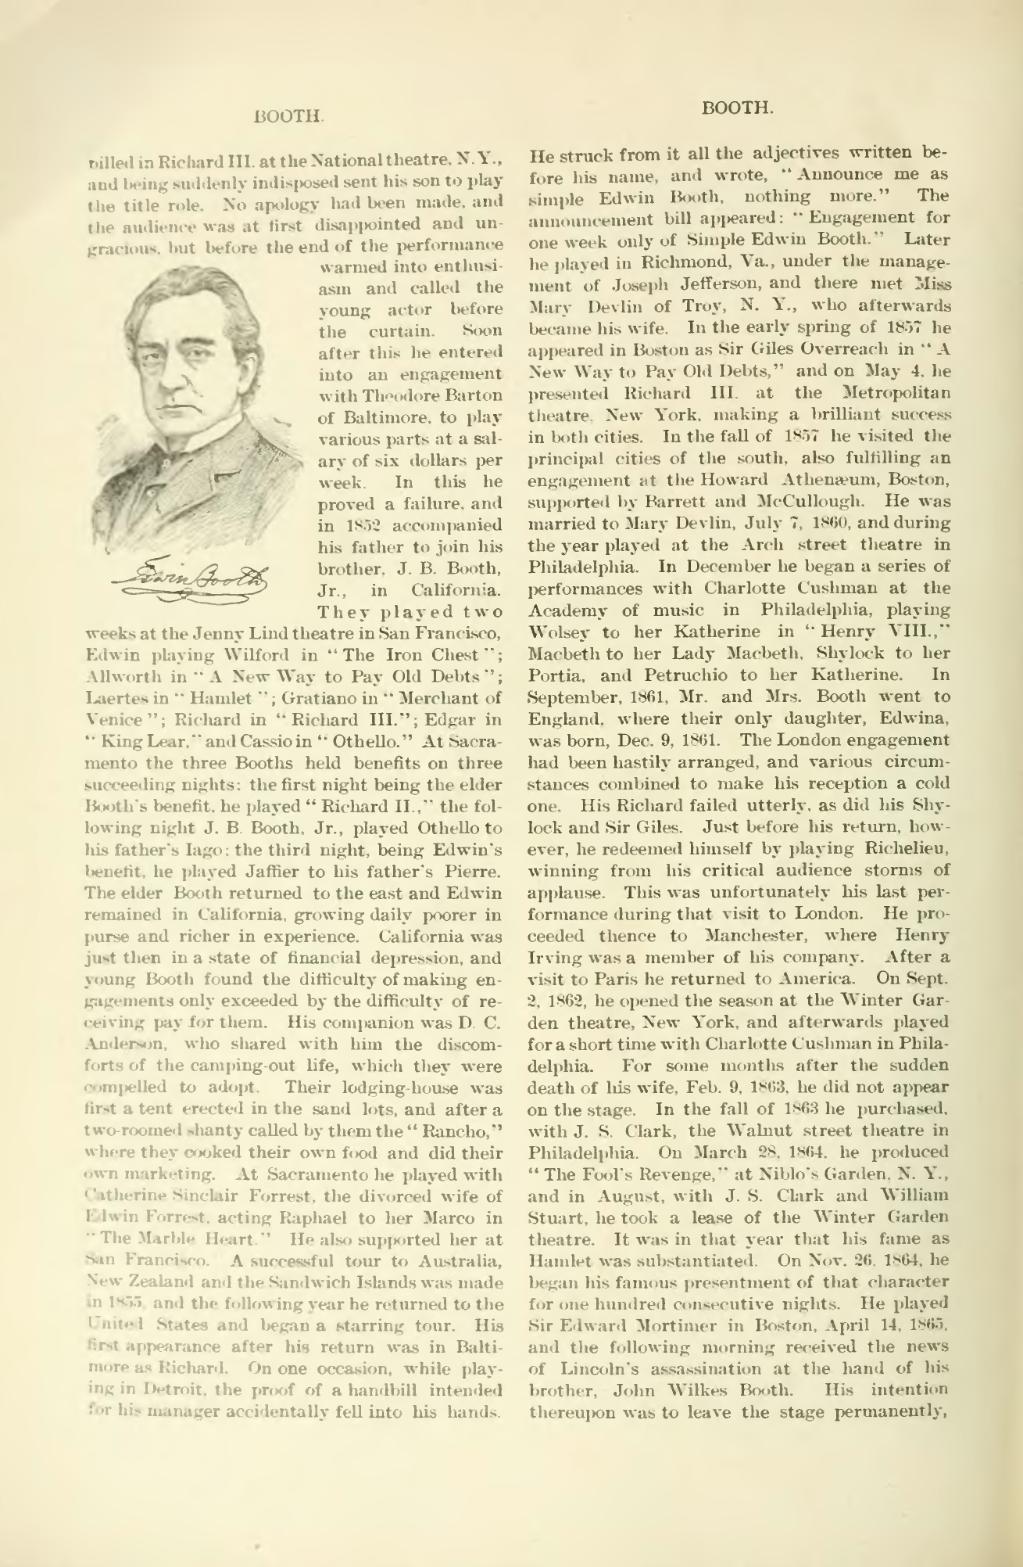 EDWIN BOOTH ACTOR SHYLOCK MACBETH HAMLET THEATRE